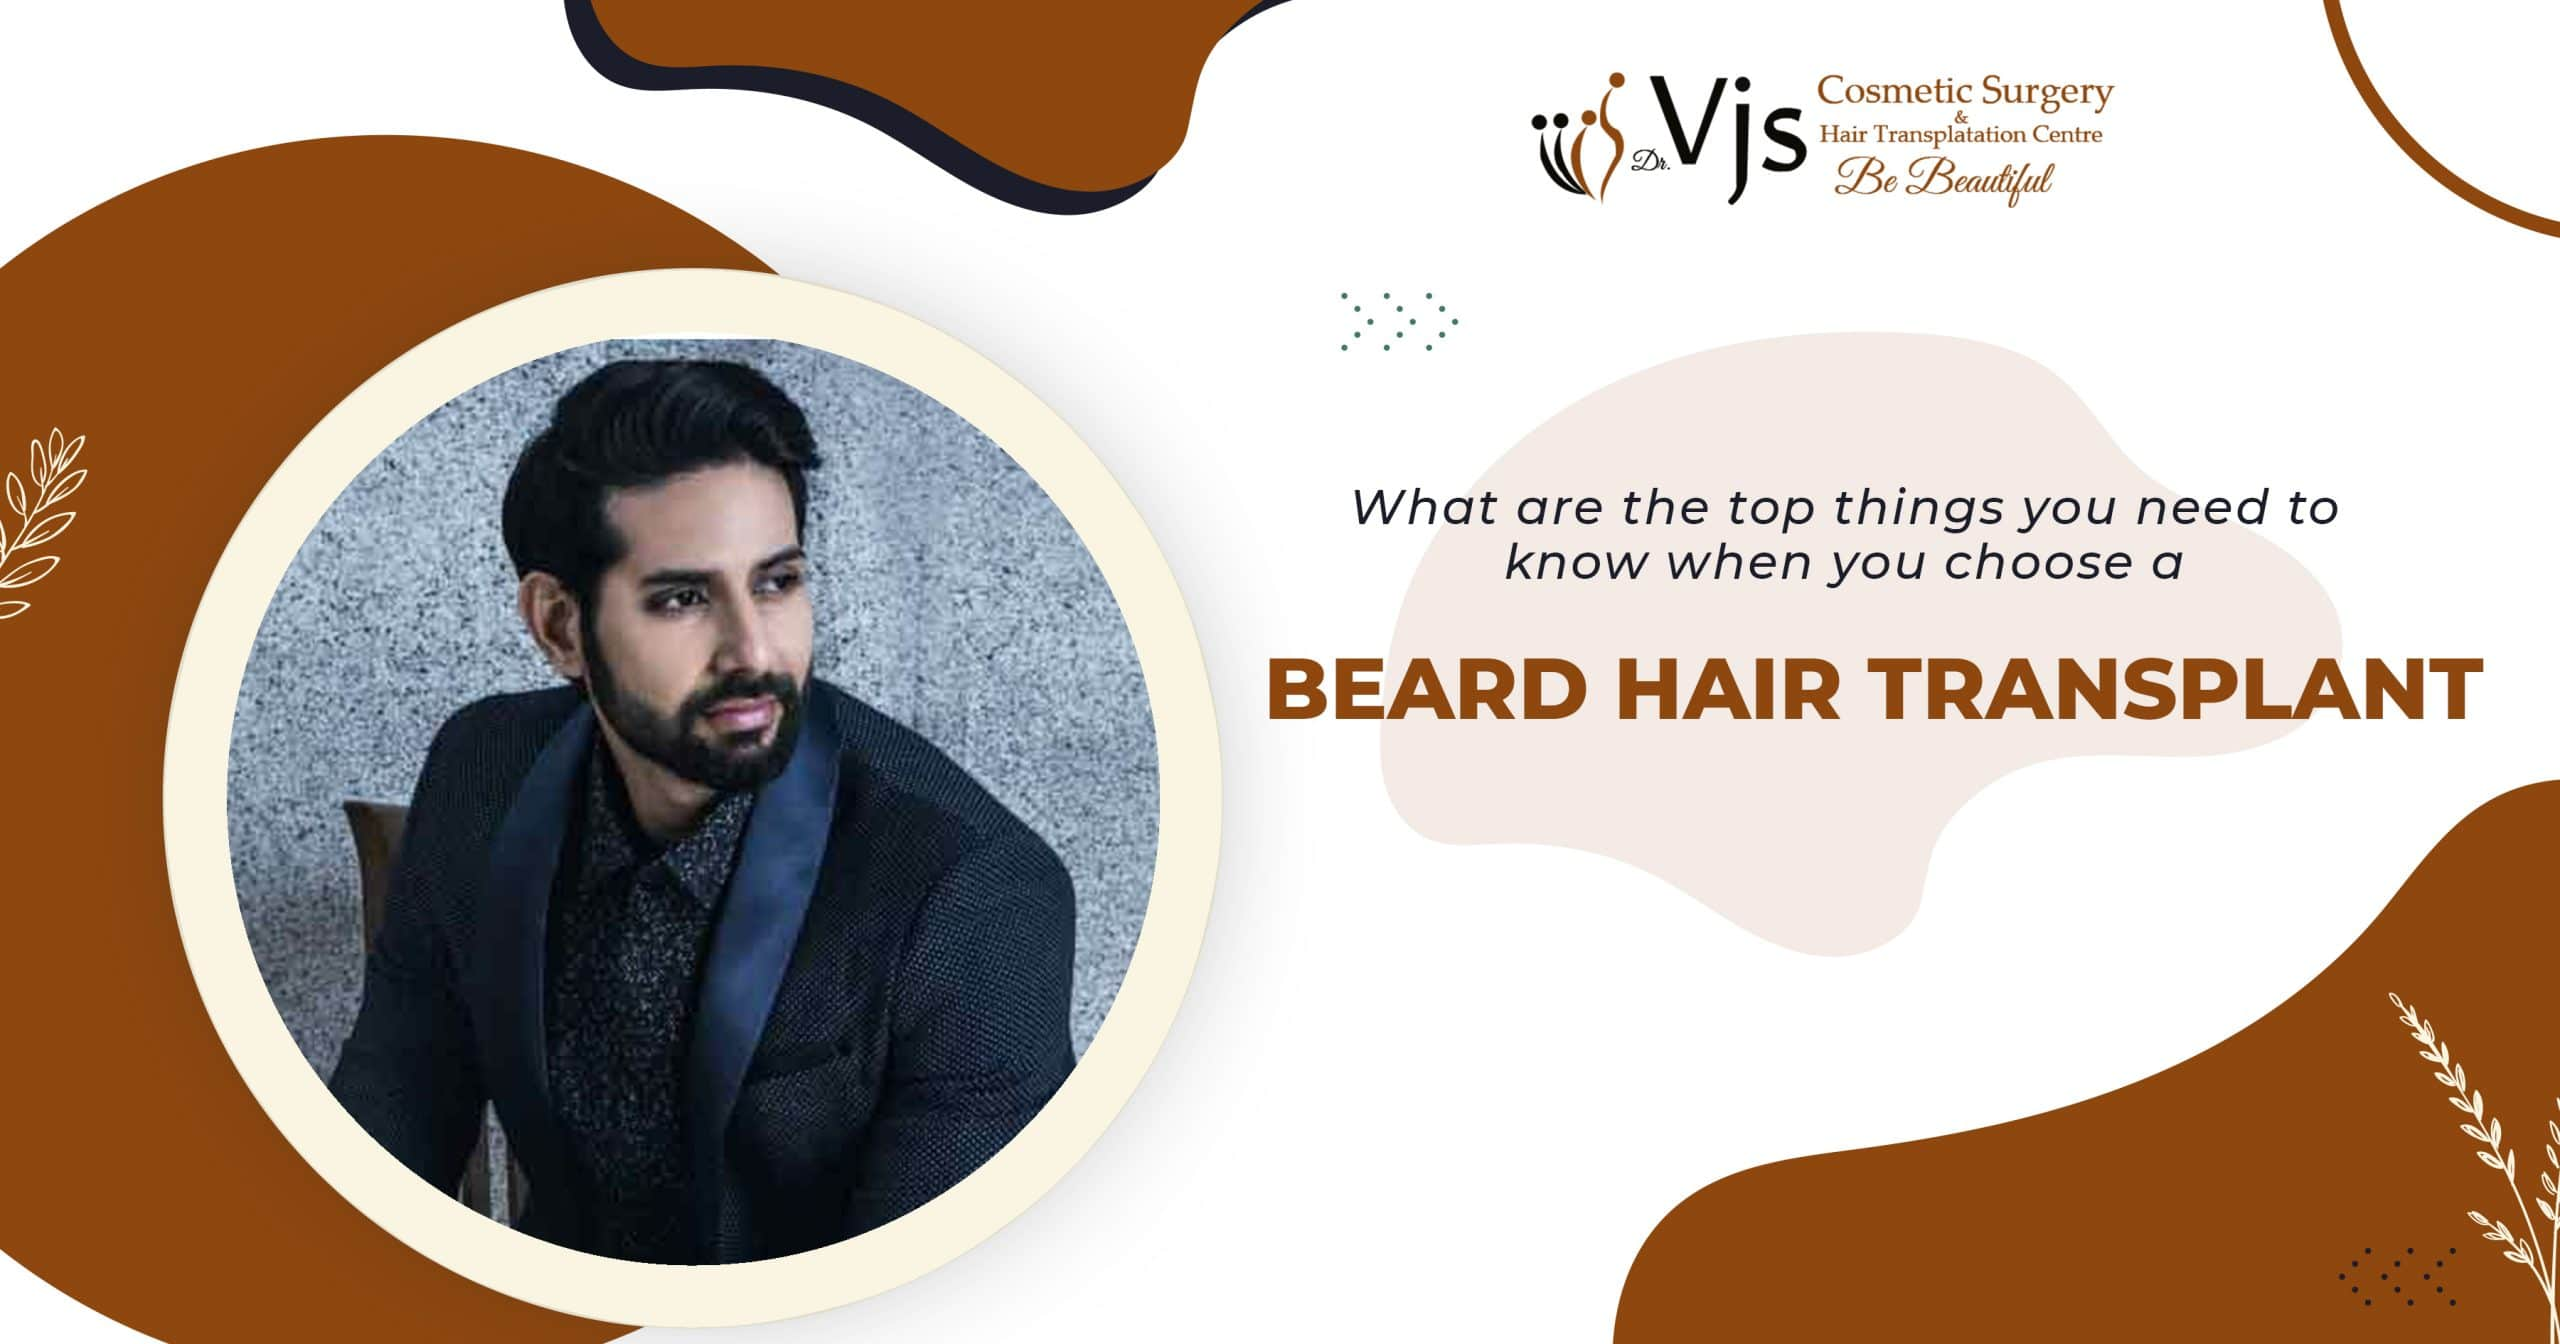 treatment of beard hair transplant India